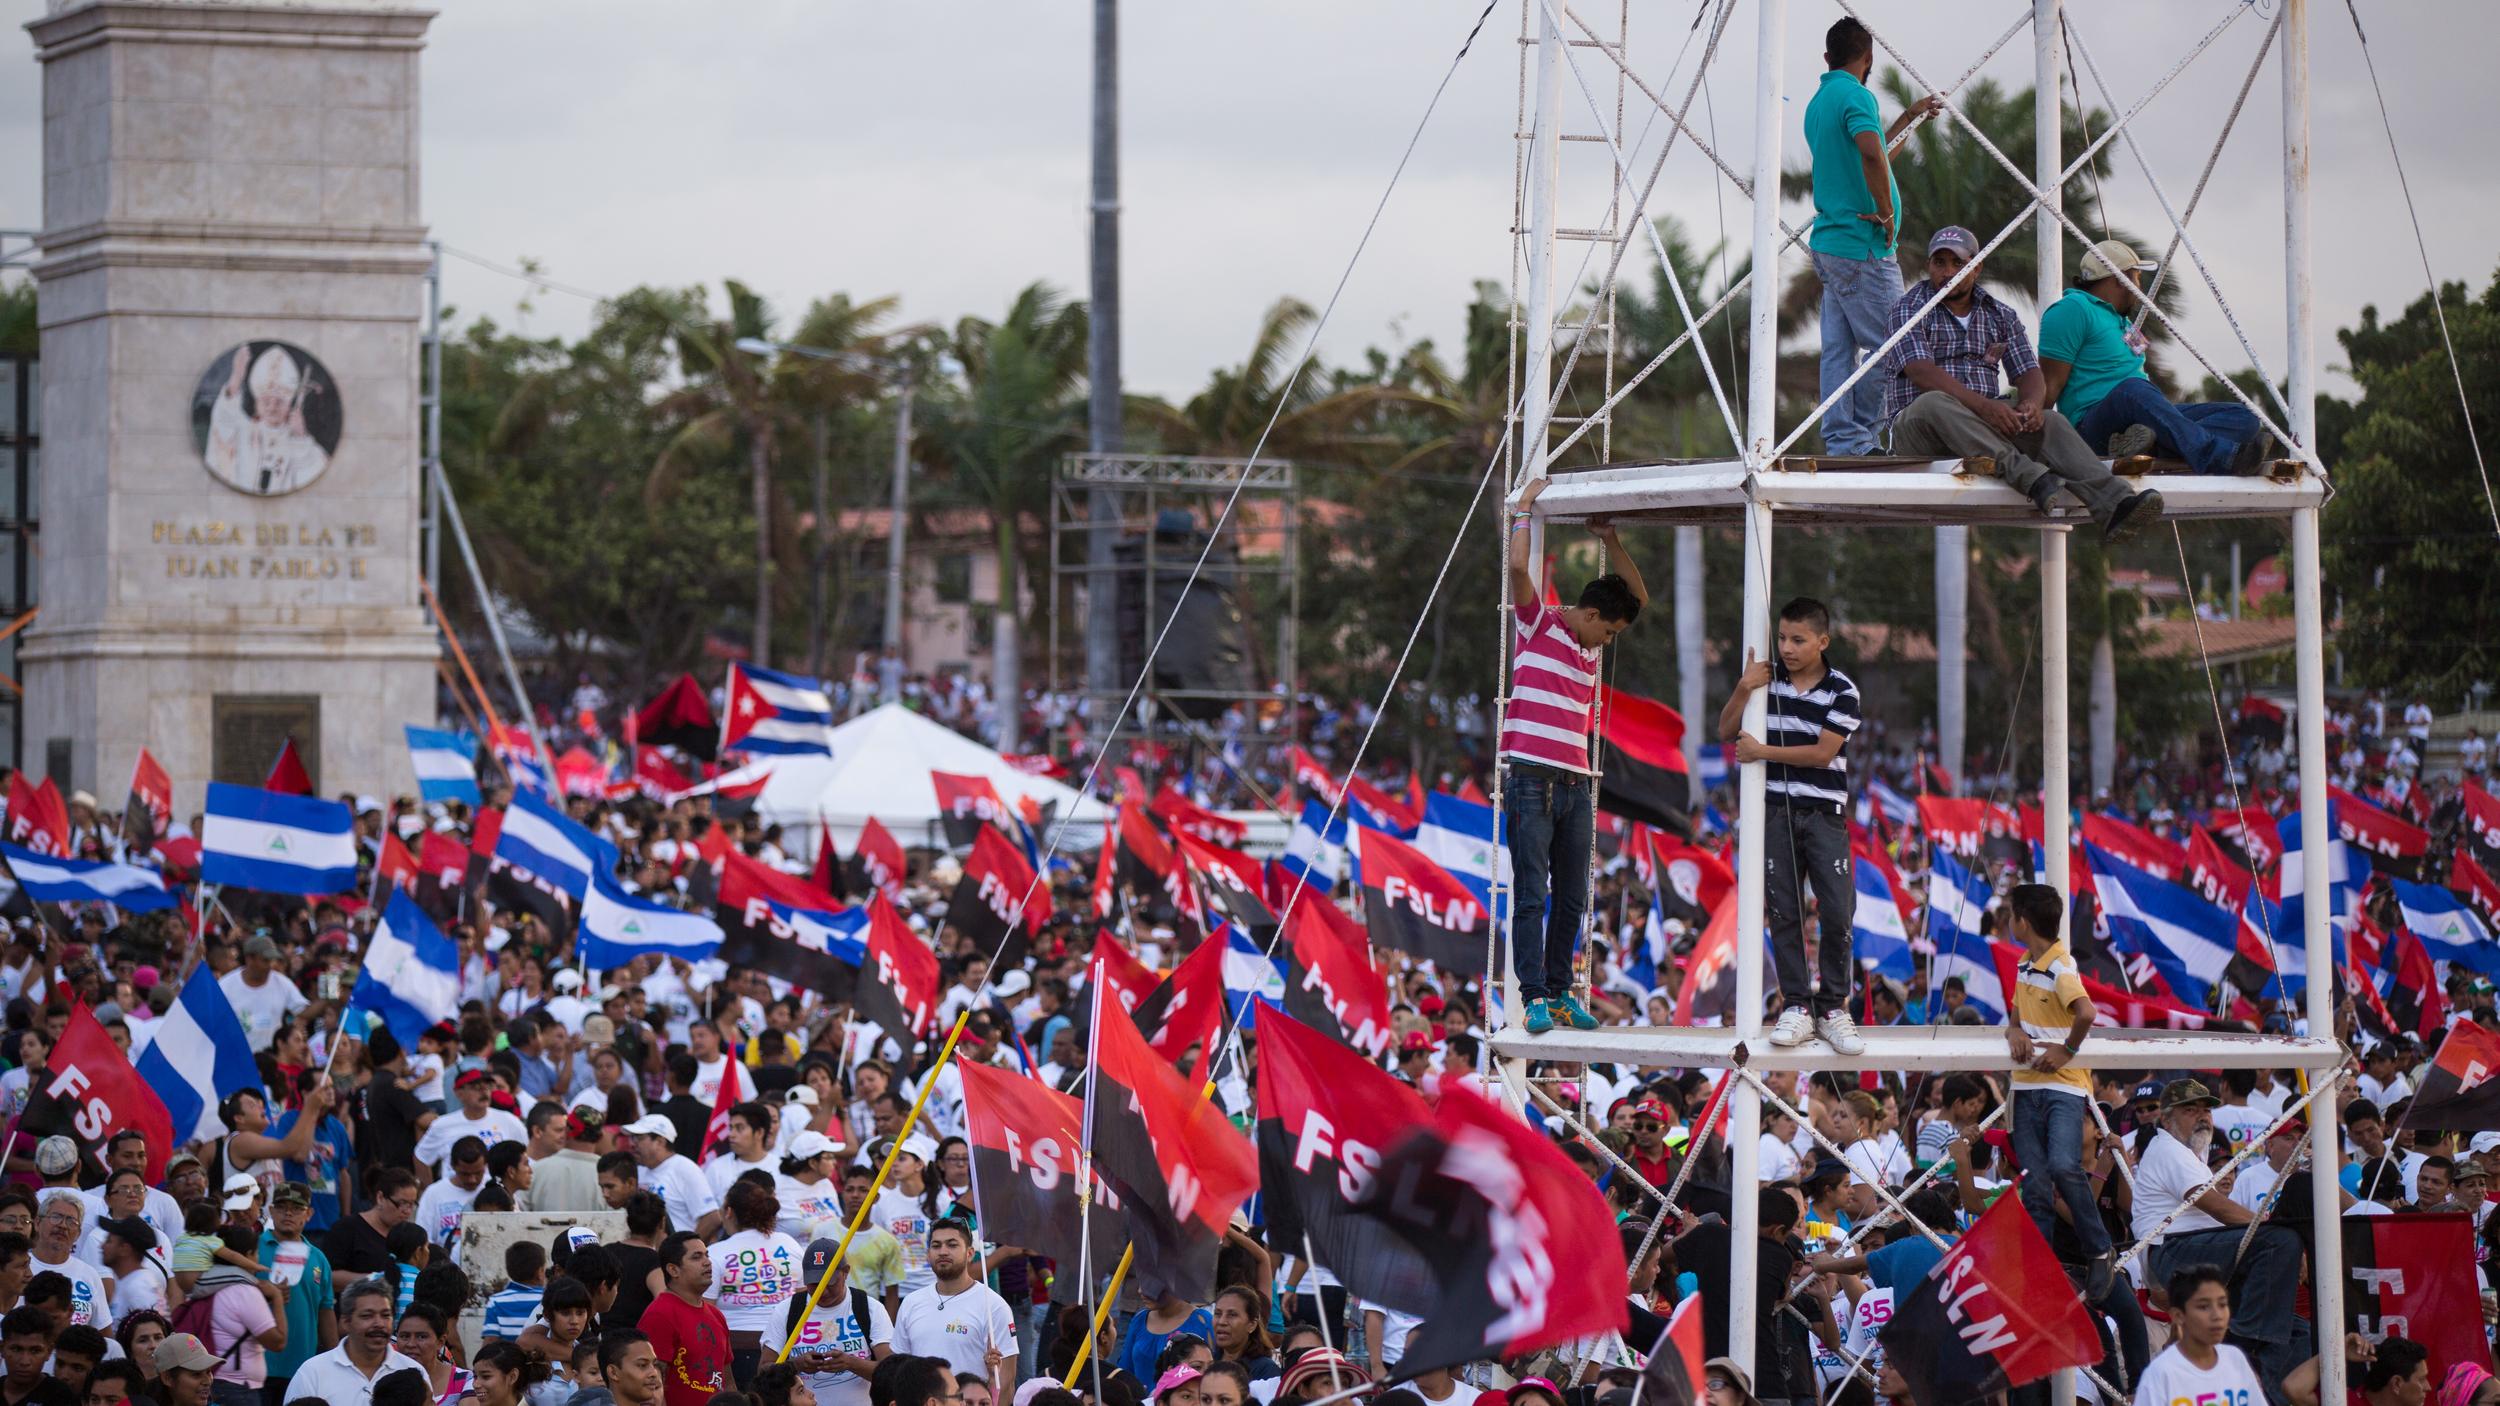 35th Anniversary of the Sandinista Revolution